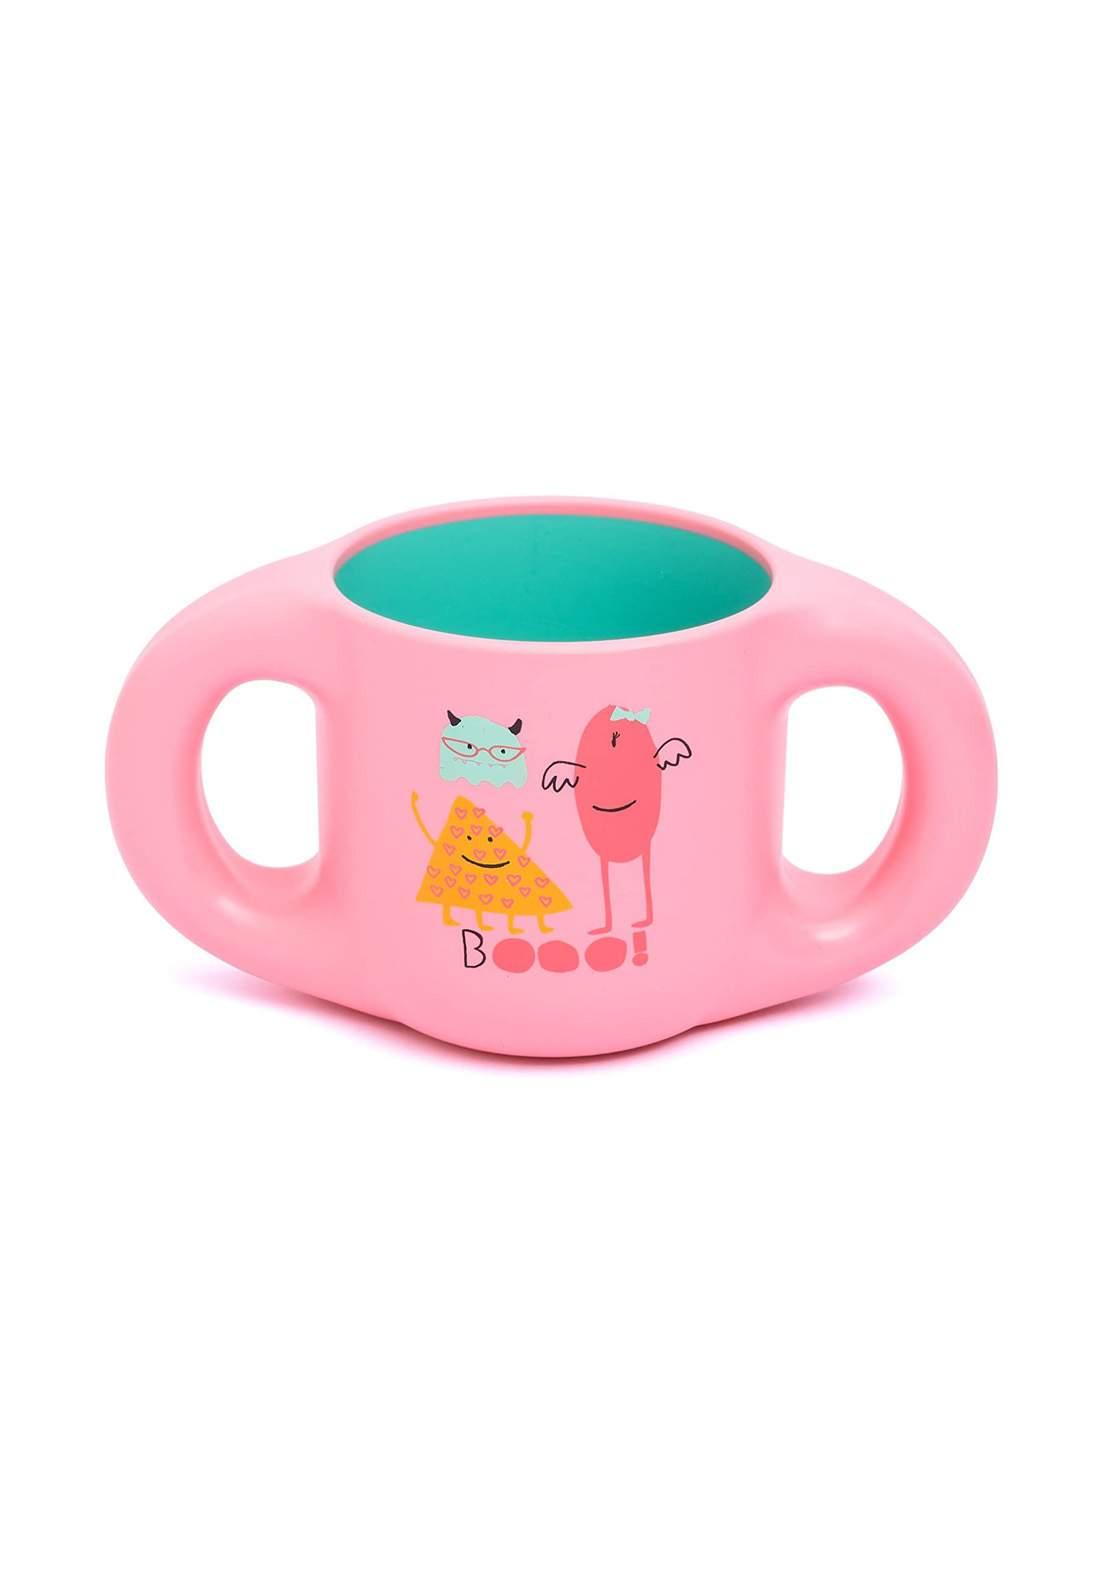 Suavinex Baby Training Cup قدح للاطفال